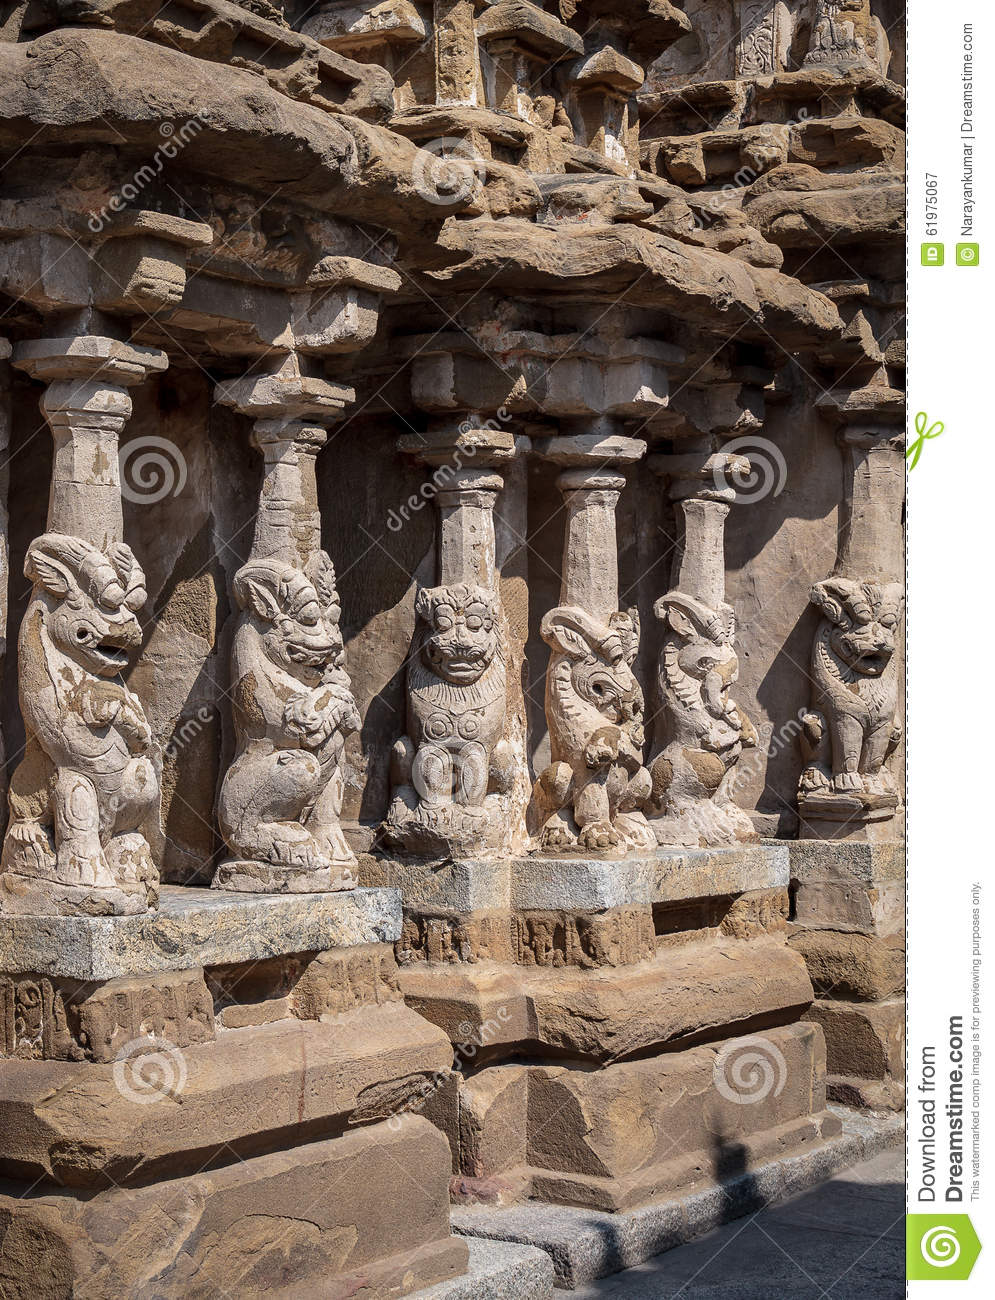 Lion Pillars In Ancient Hindu Temple Of The Pallavas, Kanchipuram.